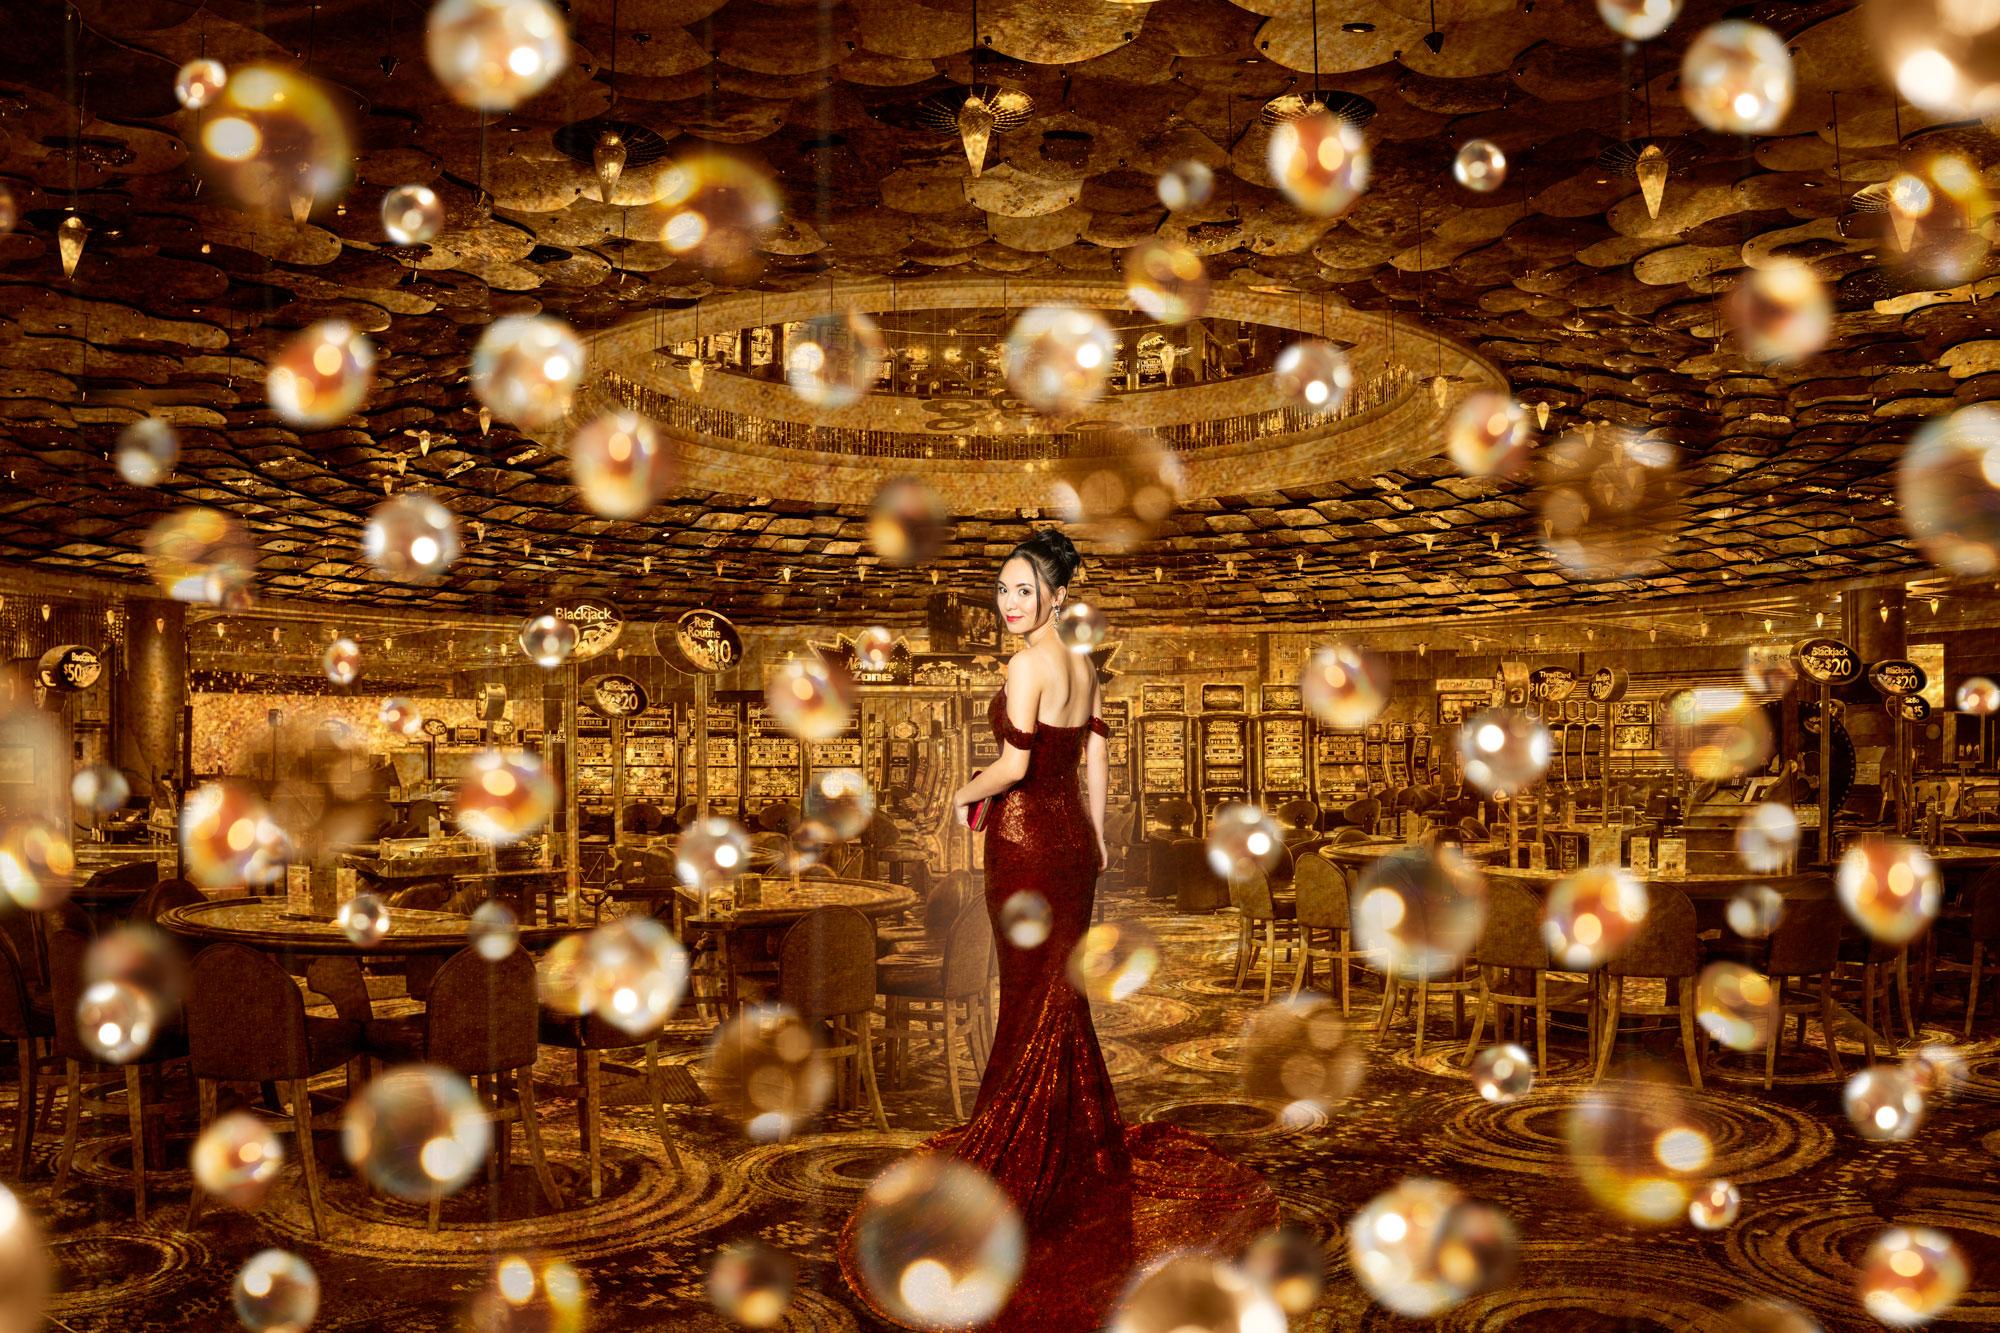 Commercial Casino Lifestyle Photography by Adrian Kilchherr Switzerland Europe Australia